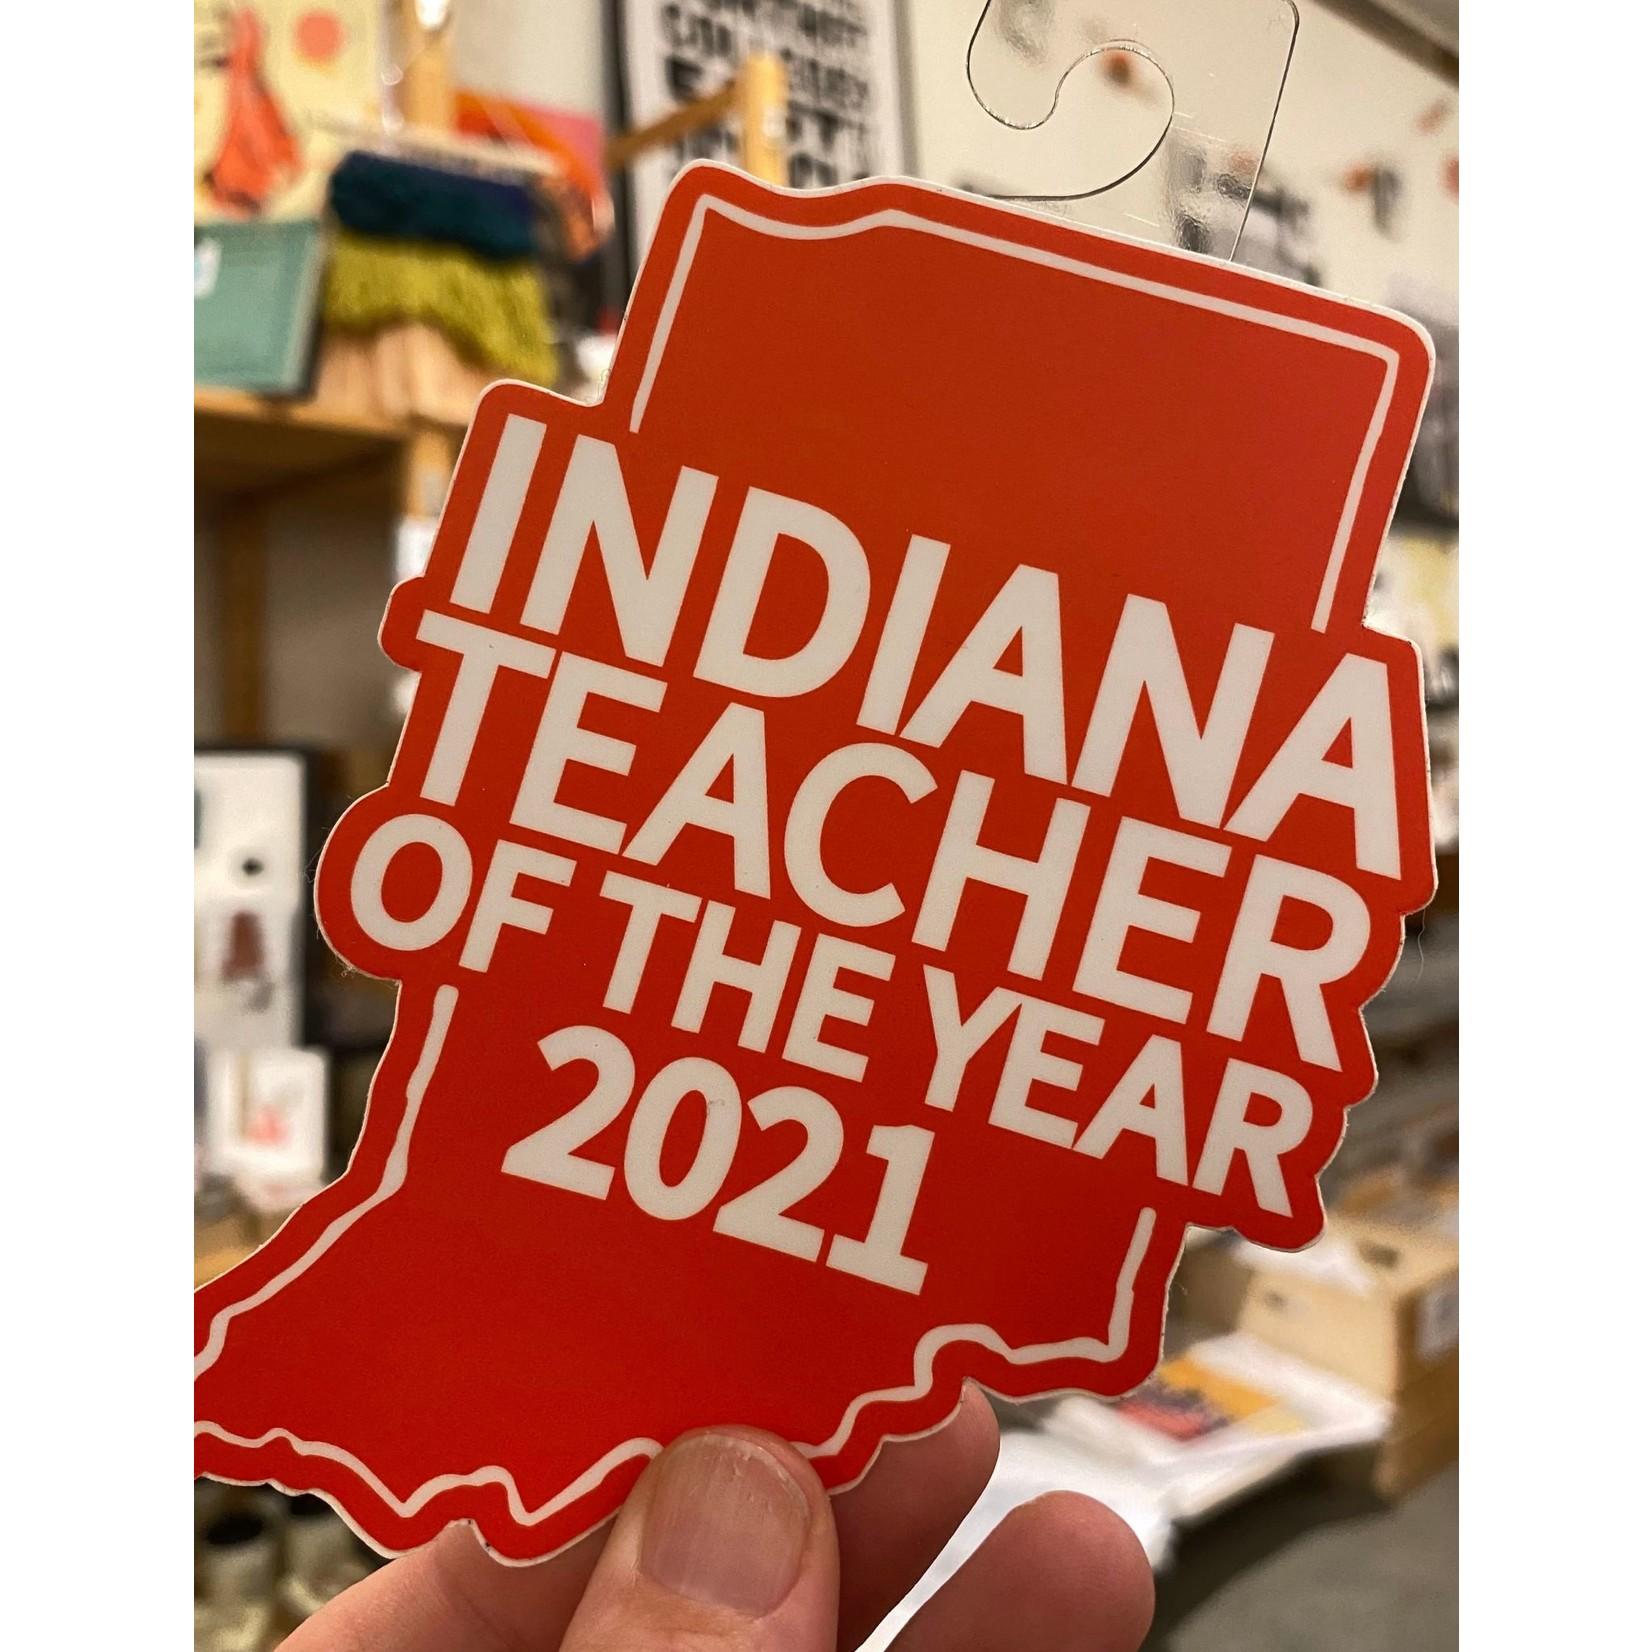 BadKneesTs IN Teacher Of The Year 2021 Sticker